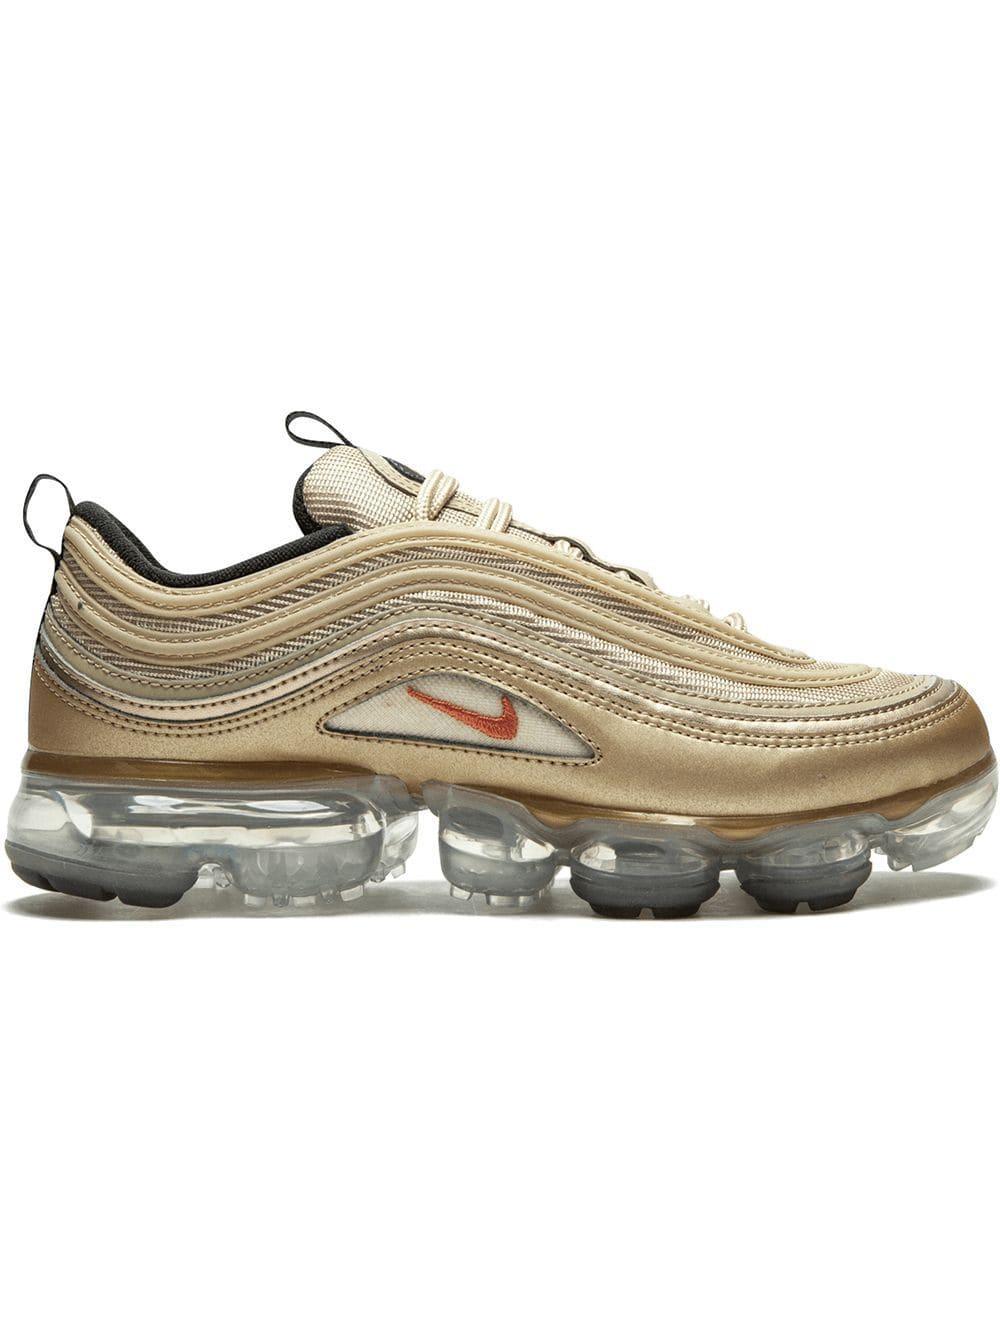 Nike Air Vapormax '97 Sneakers - Lyst